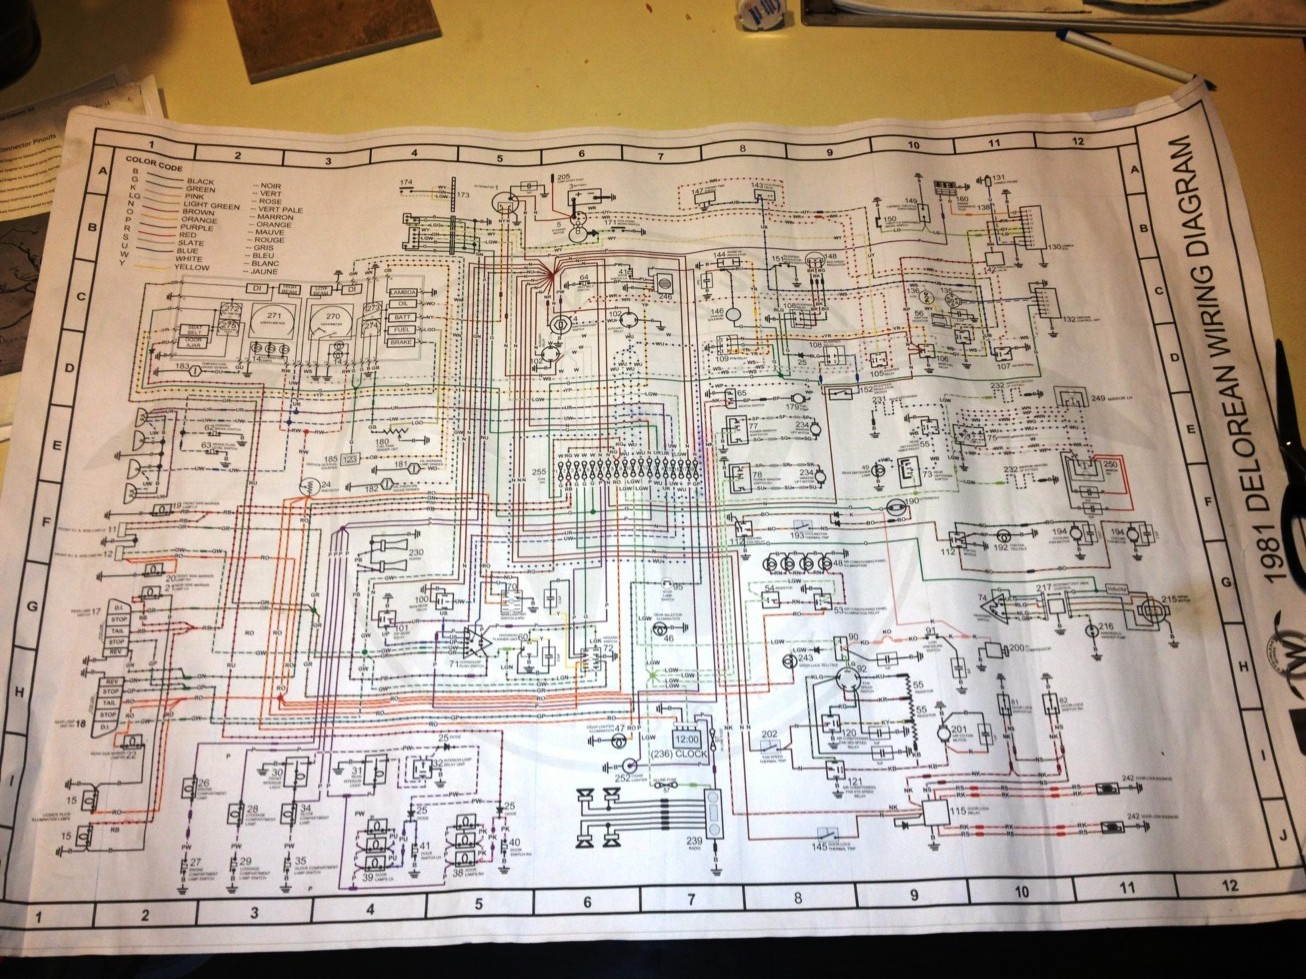 medium resolution of delorean wiring diagrams images gallery ls1 delorean may 2012 rh ls1delorean com